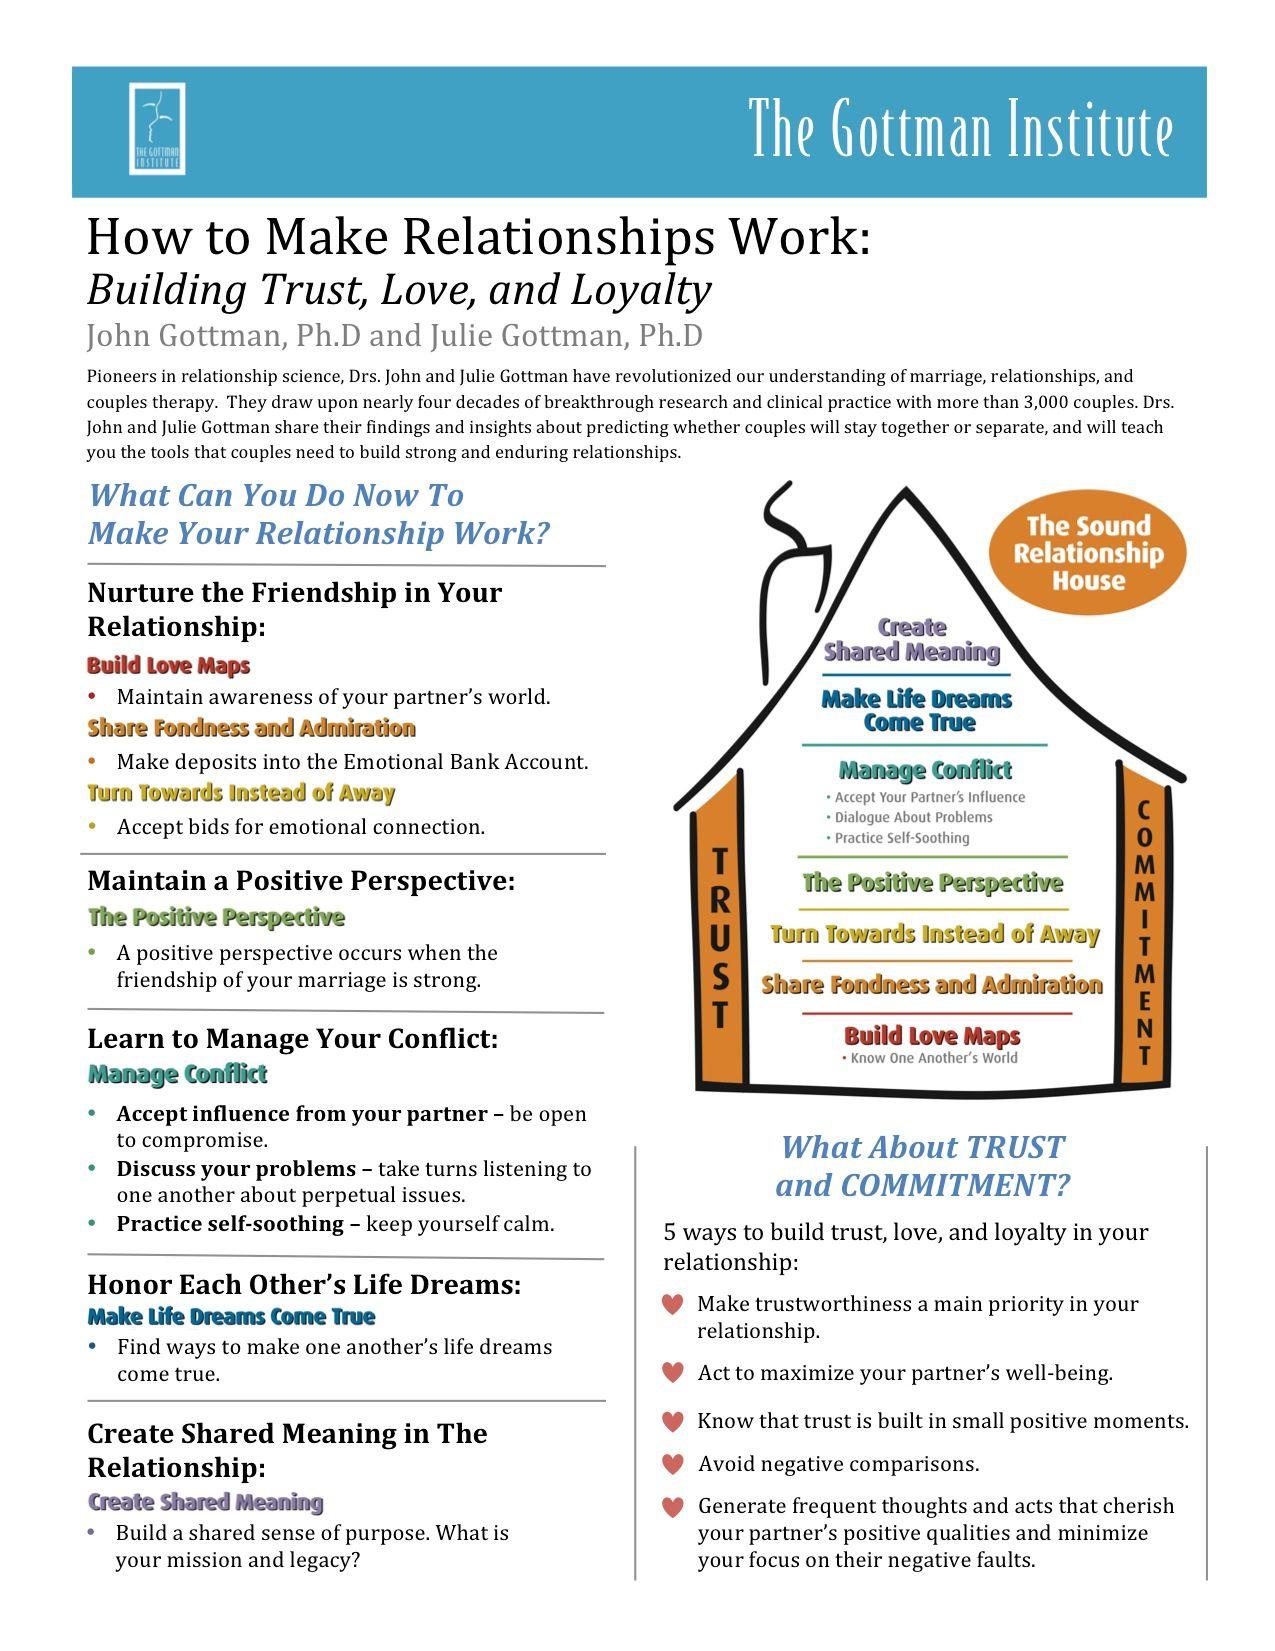 How To Make Relationships Work Evidencebased Psychology